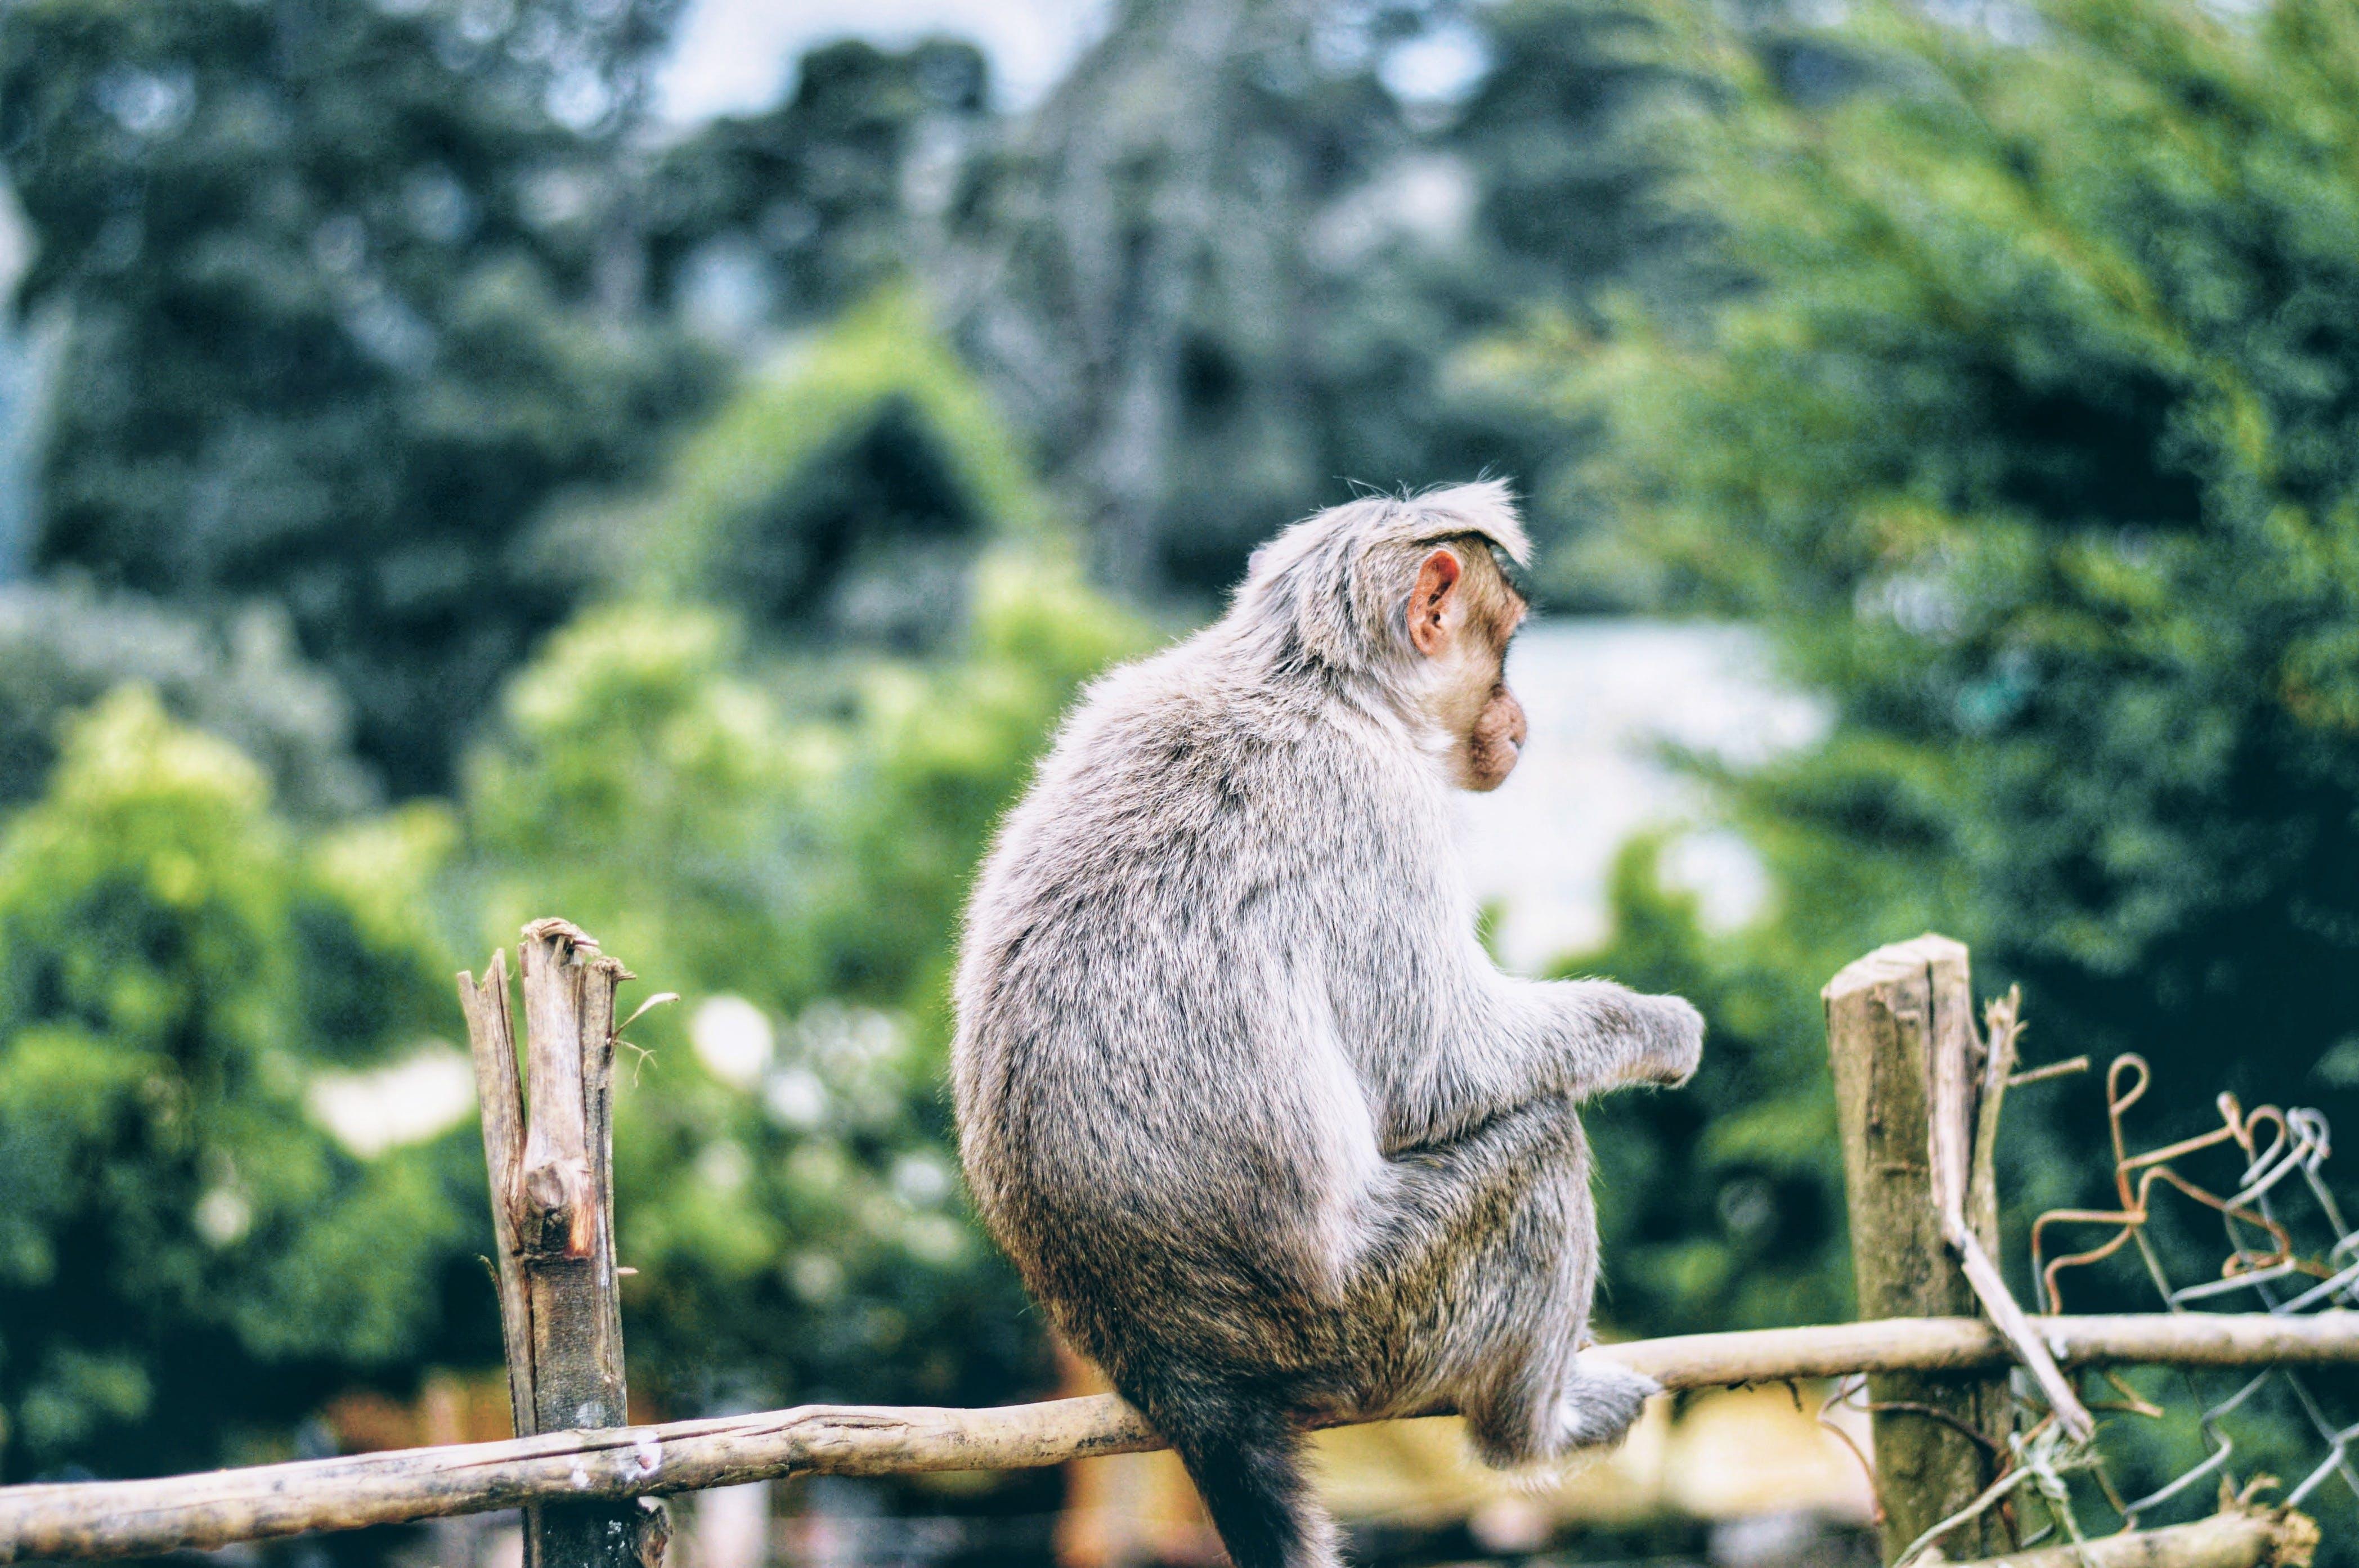 Gratis lagerfoto af abe sidder, abeunge, dyr, dyrefotografering